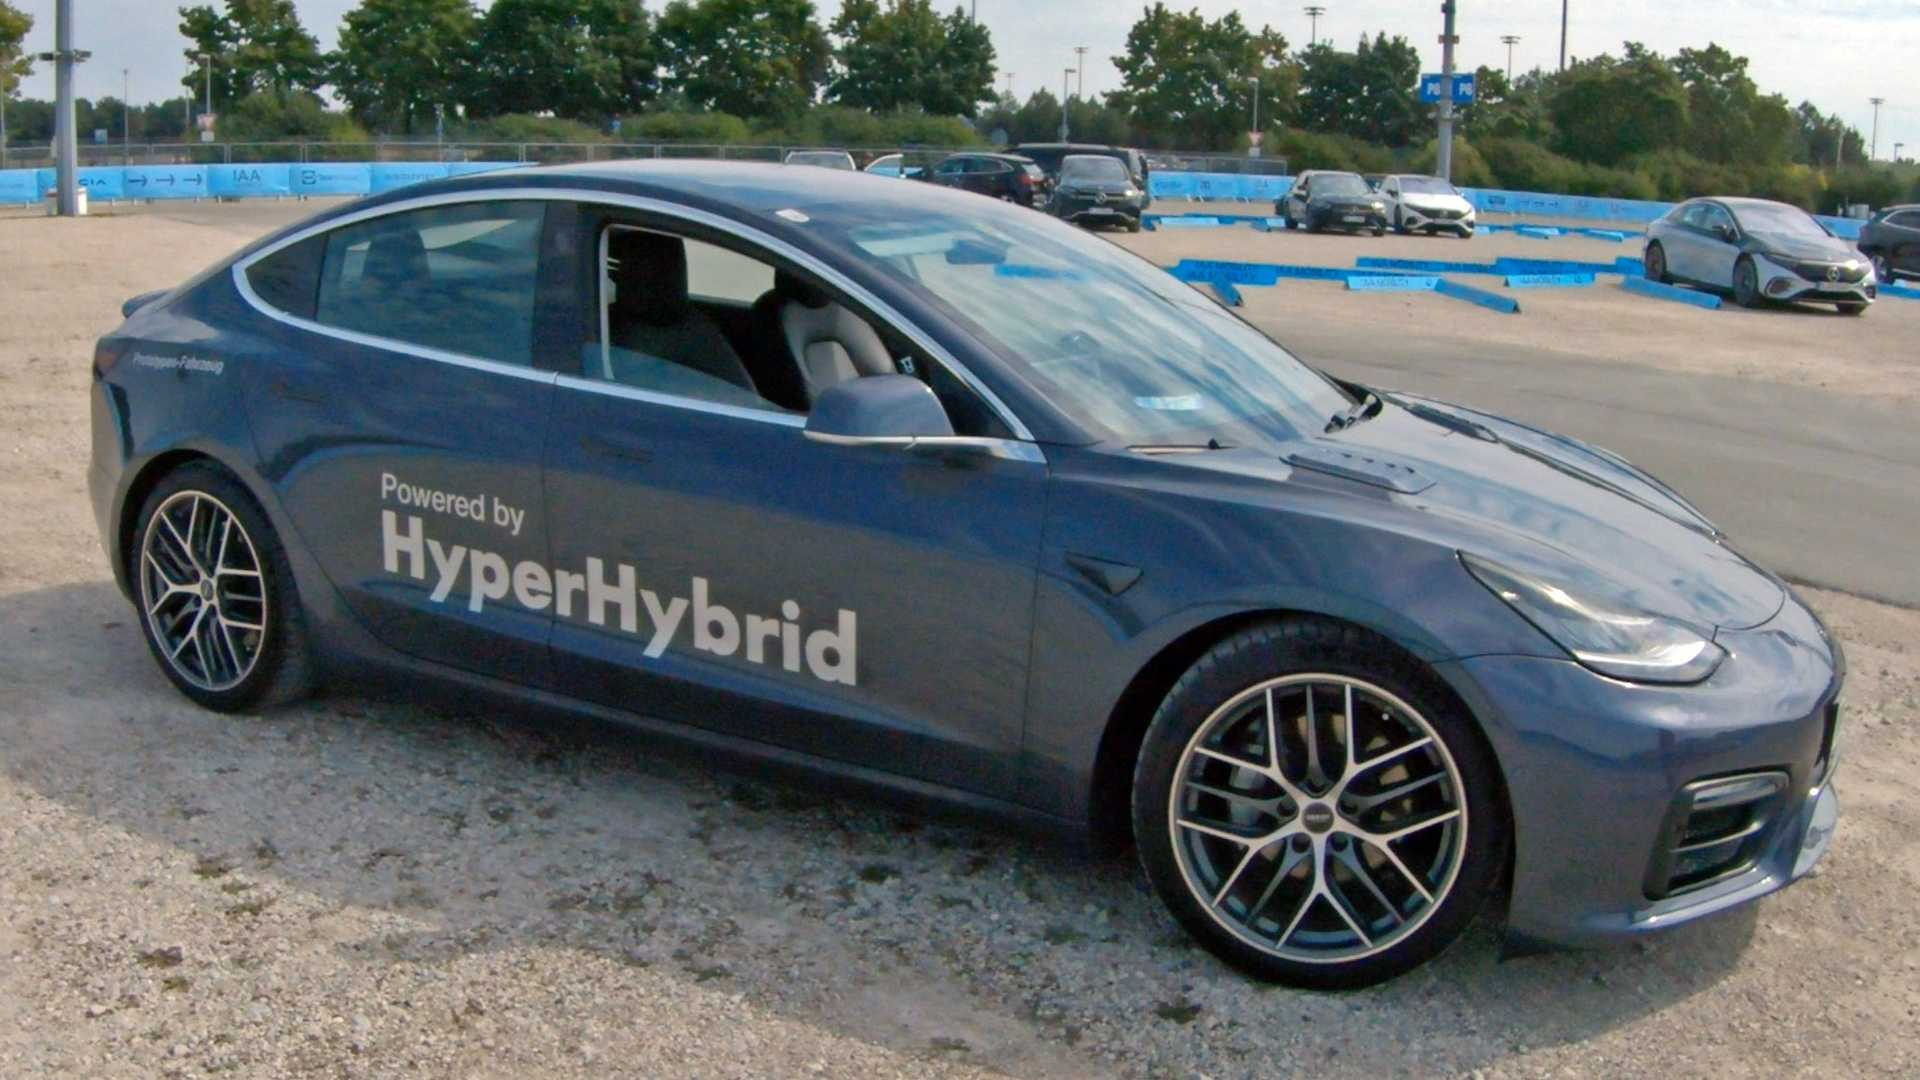 We Drive A Hybrid Tesla Model 3 That Runs On Gasoline